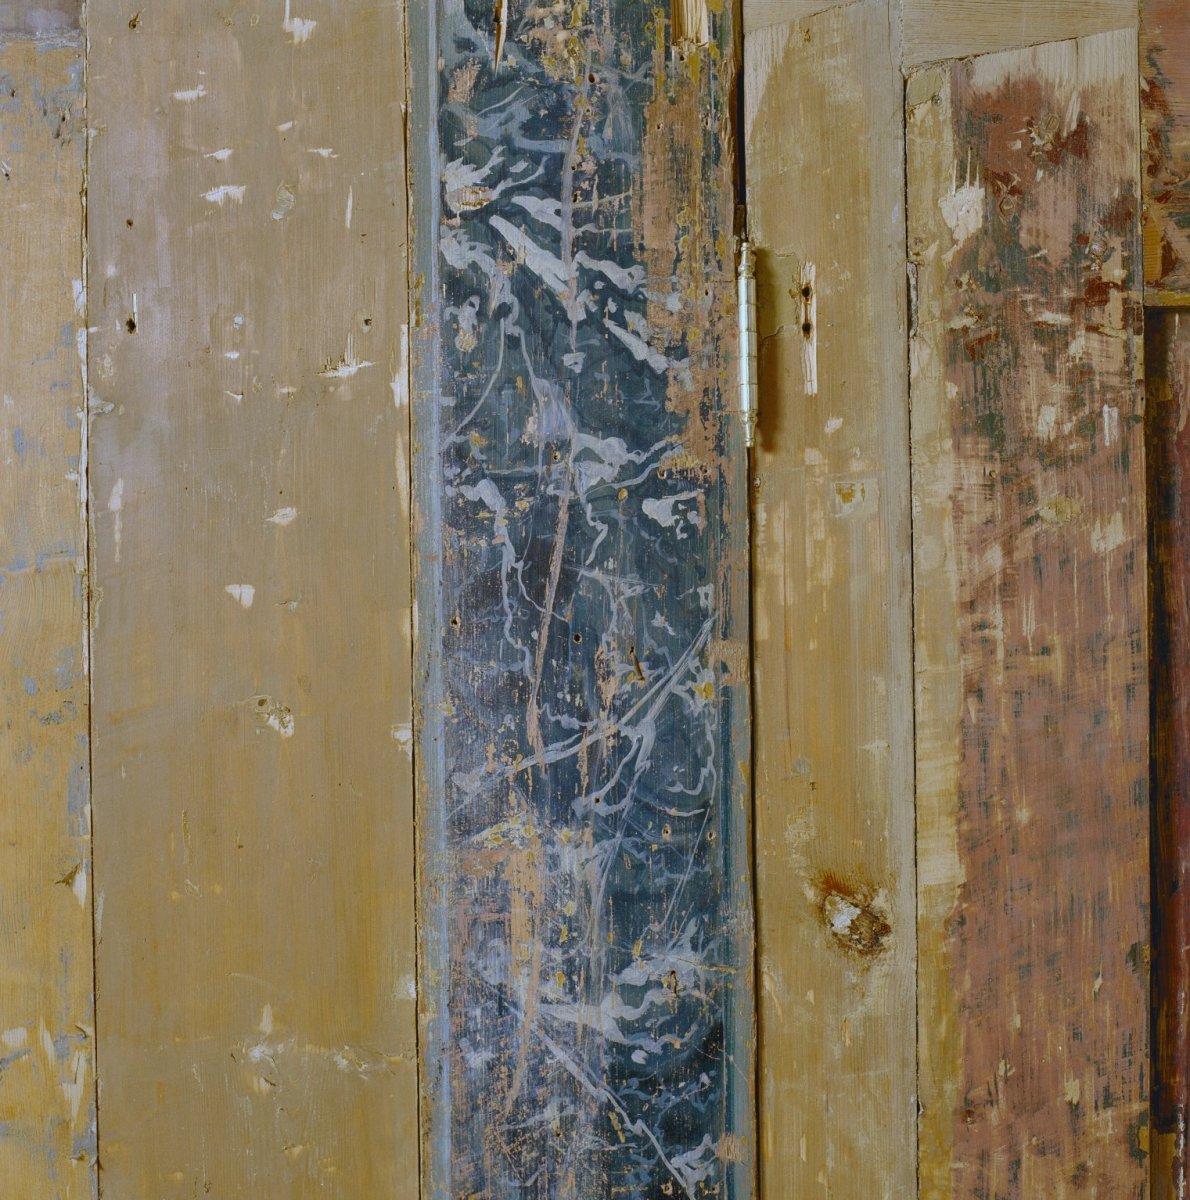 File interieur woonkamer houten wand detail zaandam 20002195 wikimedia commons - Kleden houten wand ...